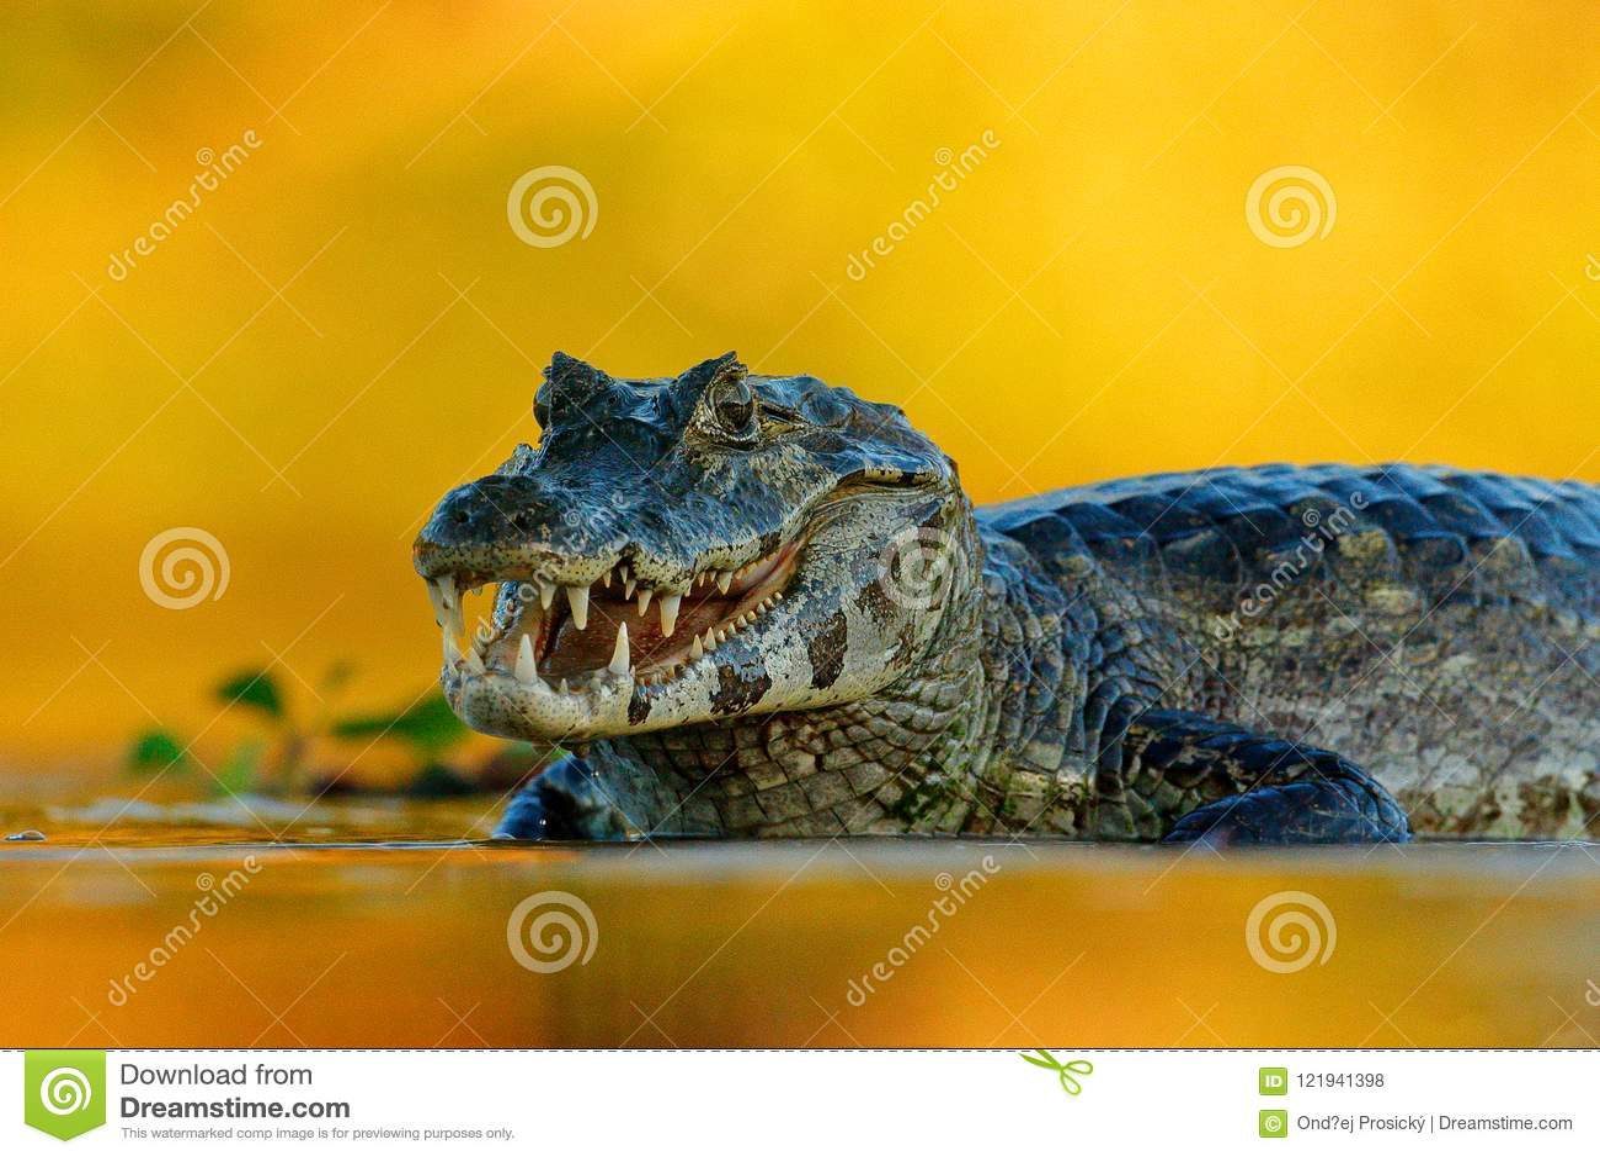 Yacare Caiman, Pantanal, Βραζιλία Πορτρέτο λεπτομέρειας του ερπετού κινδύνου Κροκόδειλος στο νερό ποταμού, που εξισώνει το φως